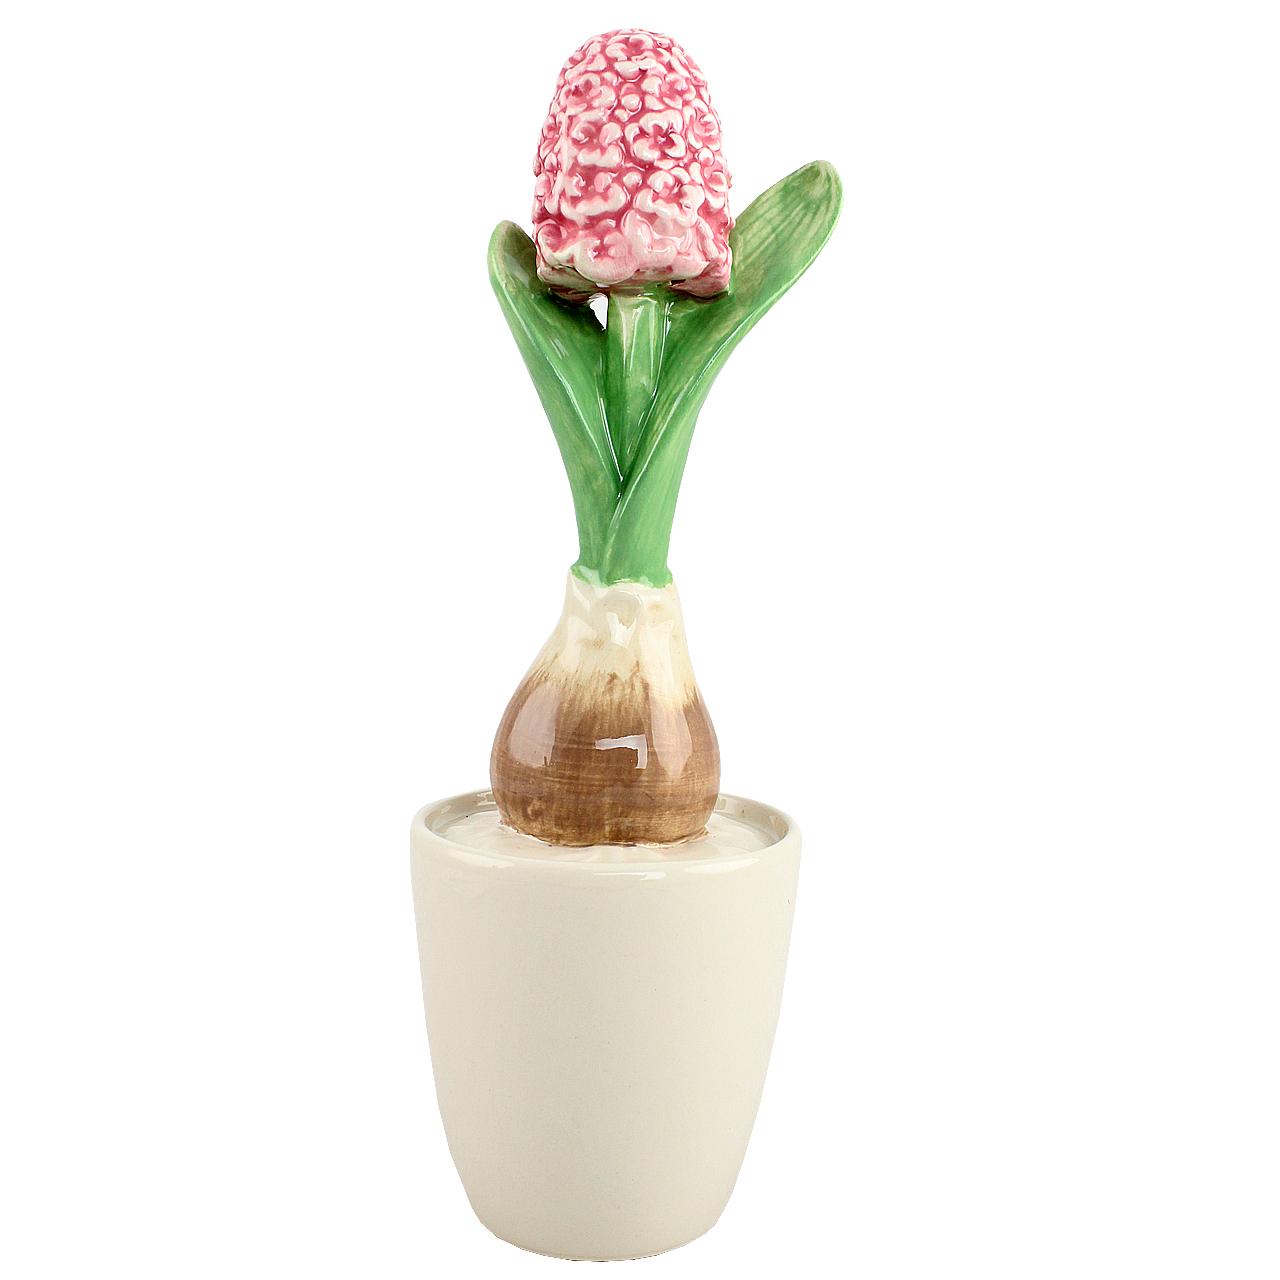 Floare decorativa Ivory zambila in bulb din ceramica 21 cm( 391672)